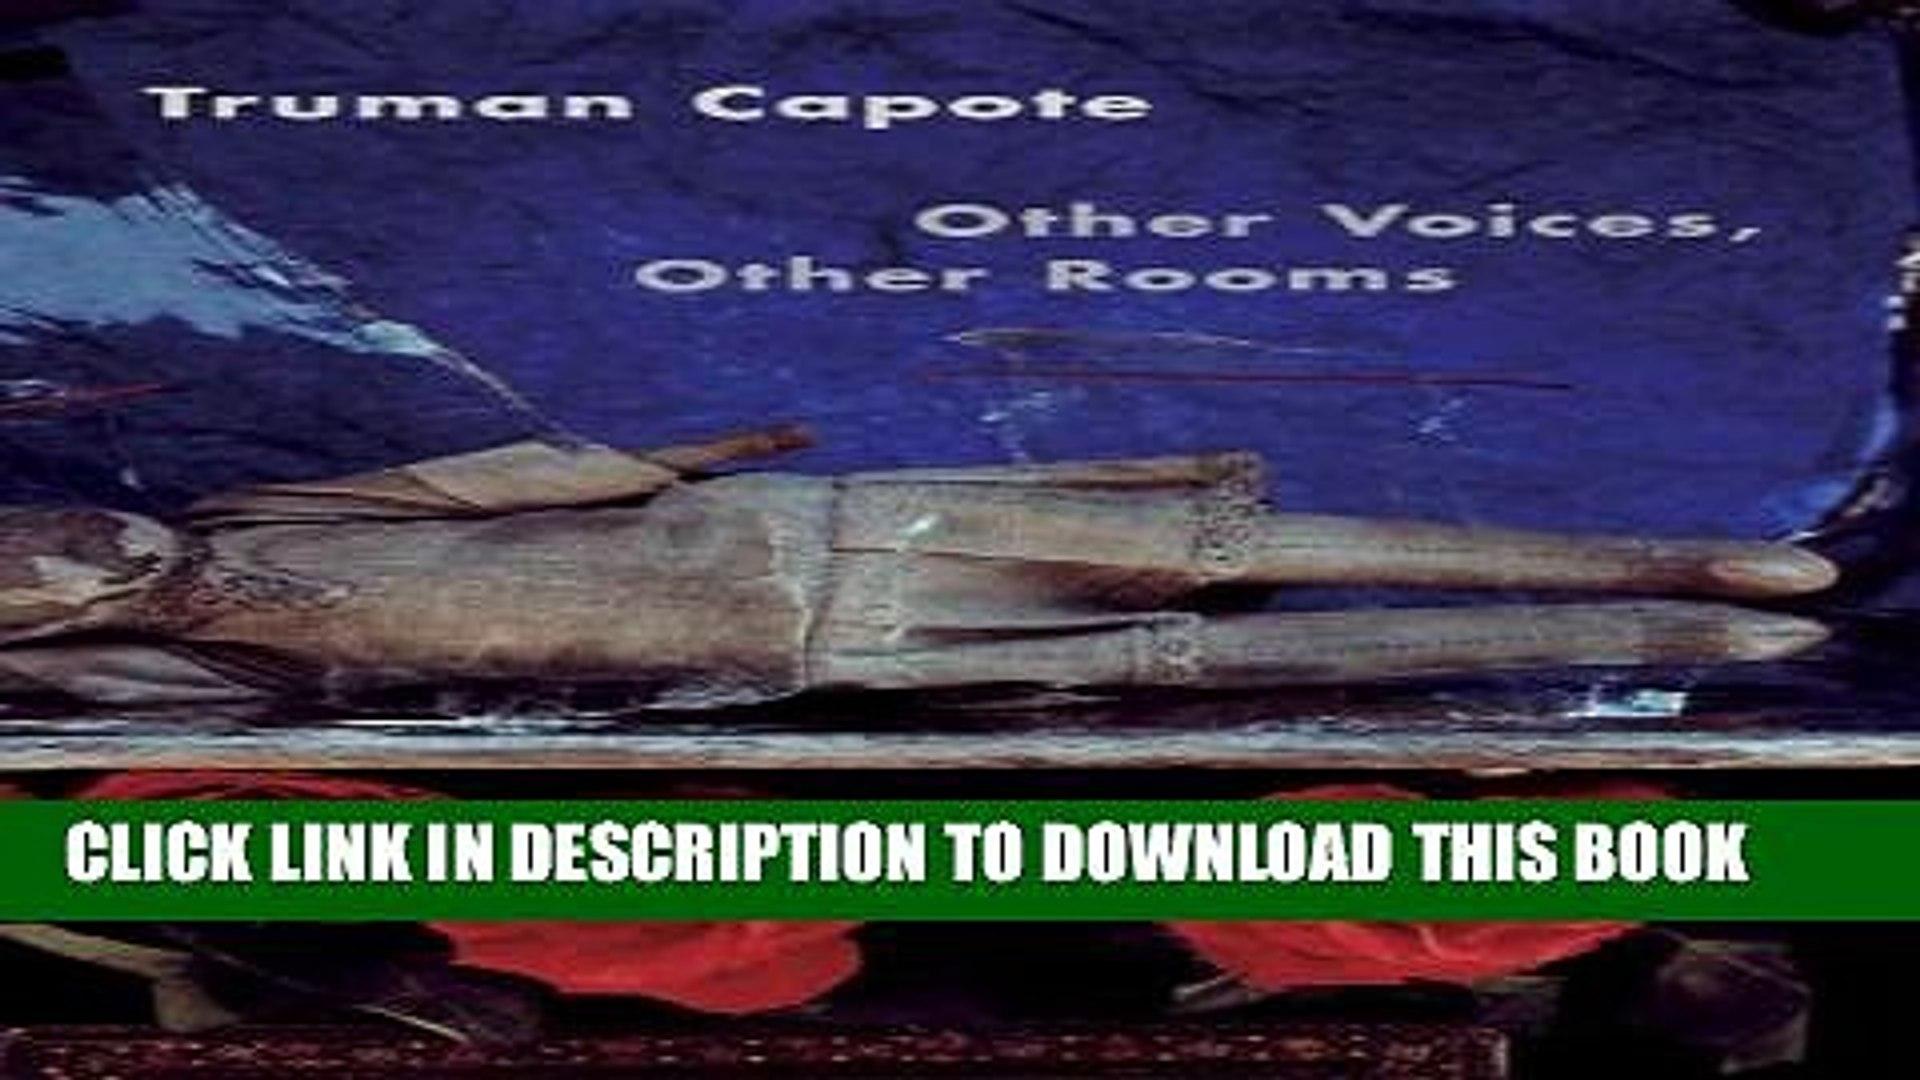 [PDF] Other Voices, Other Rooms (Vintage International) Popular Online